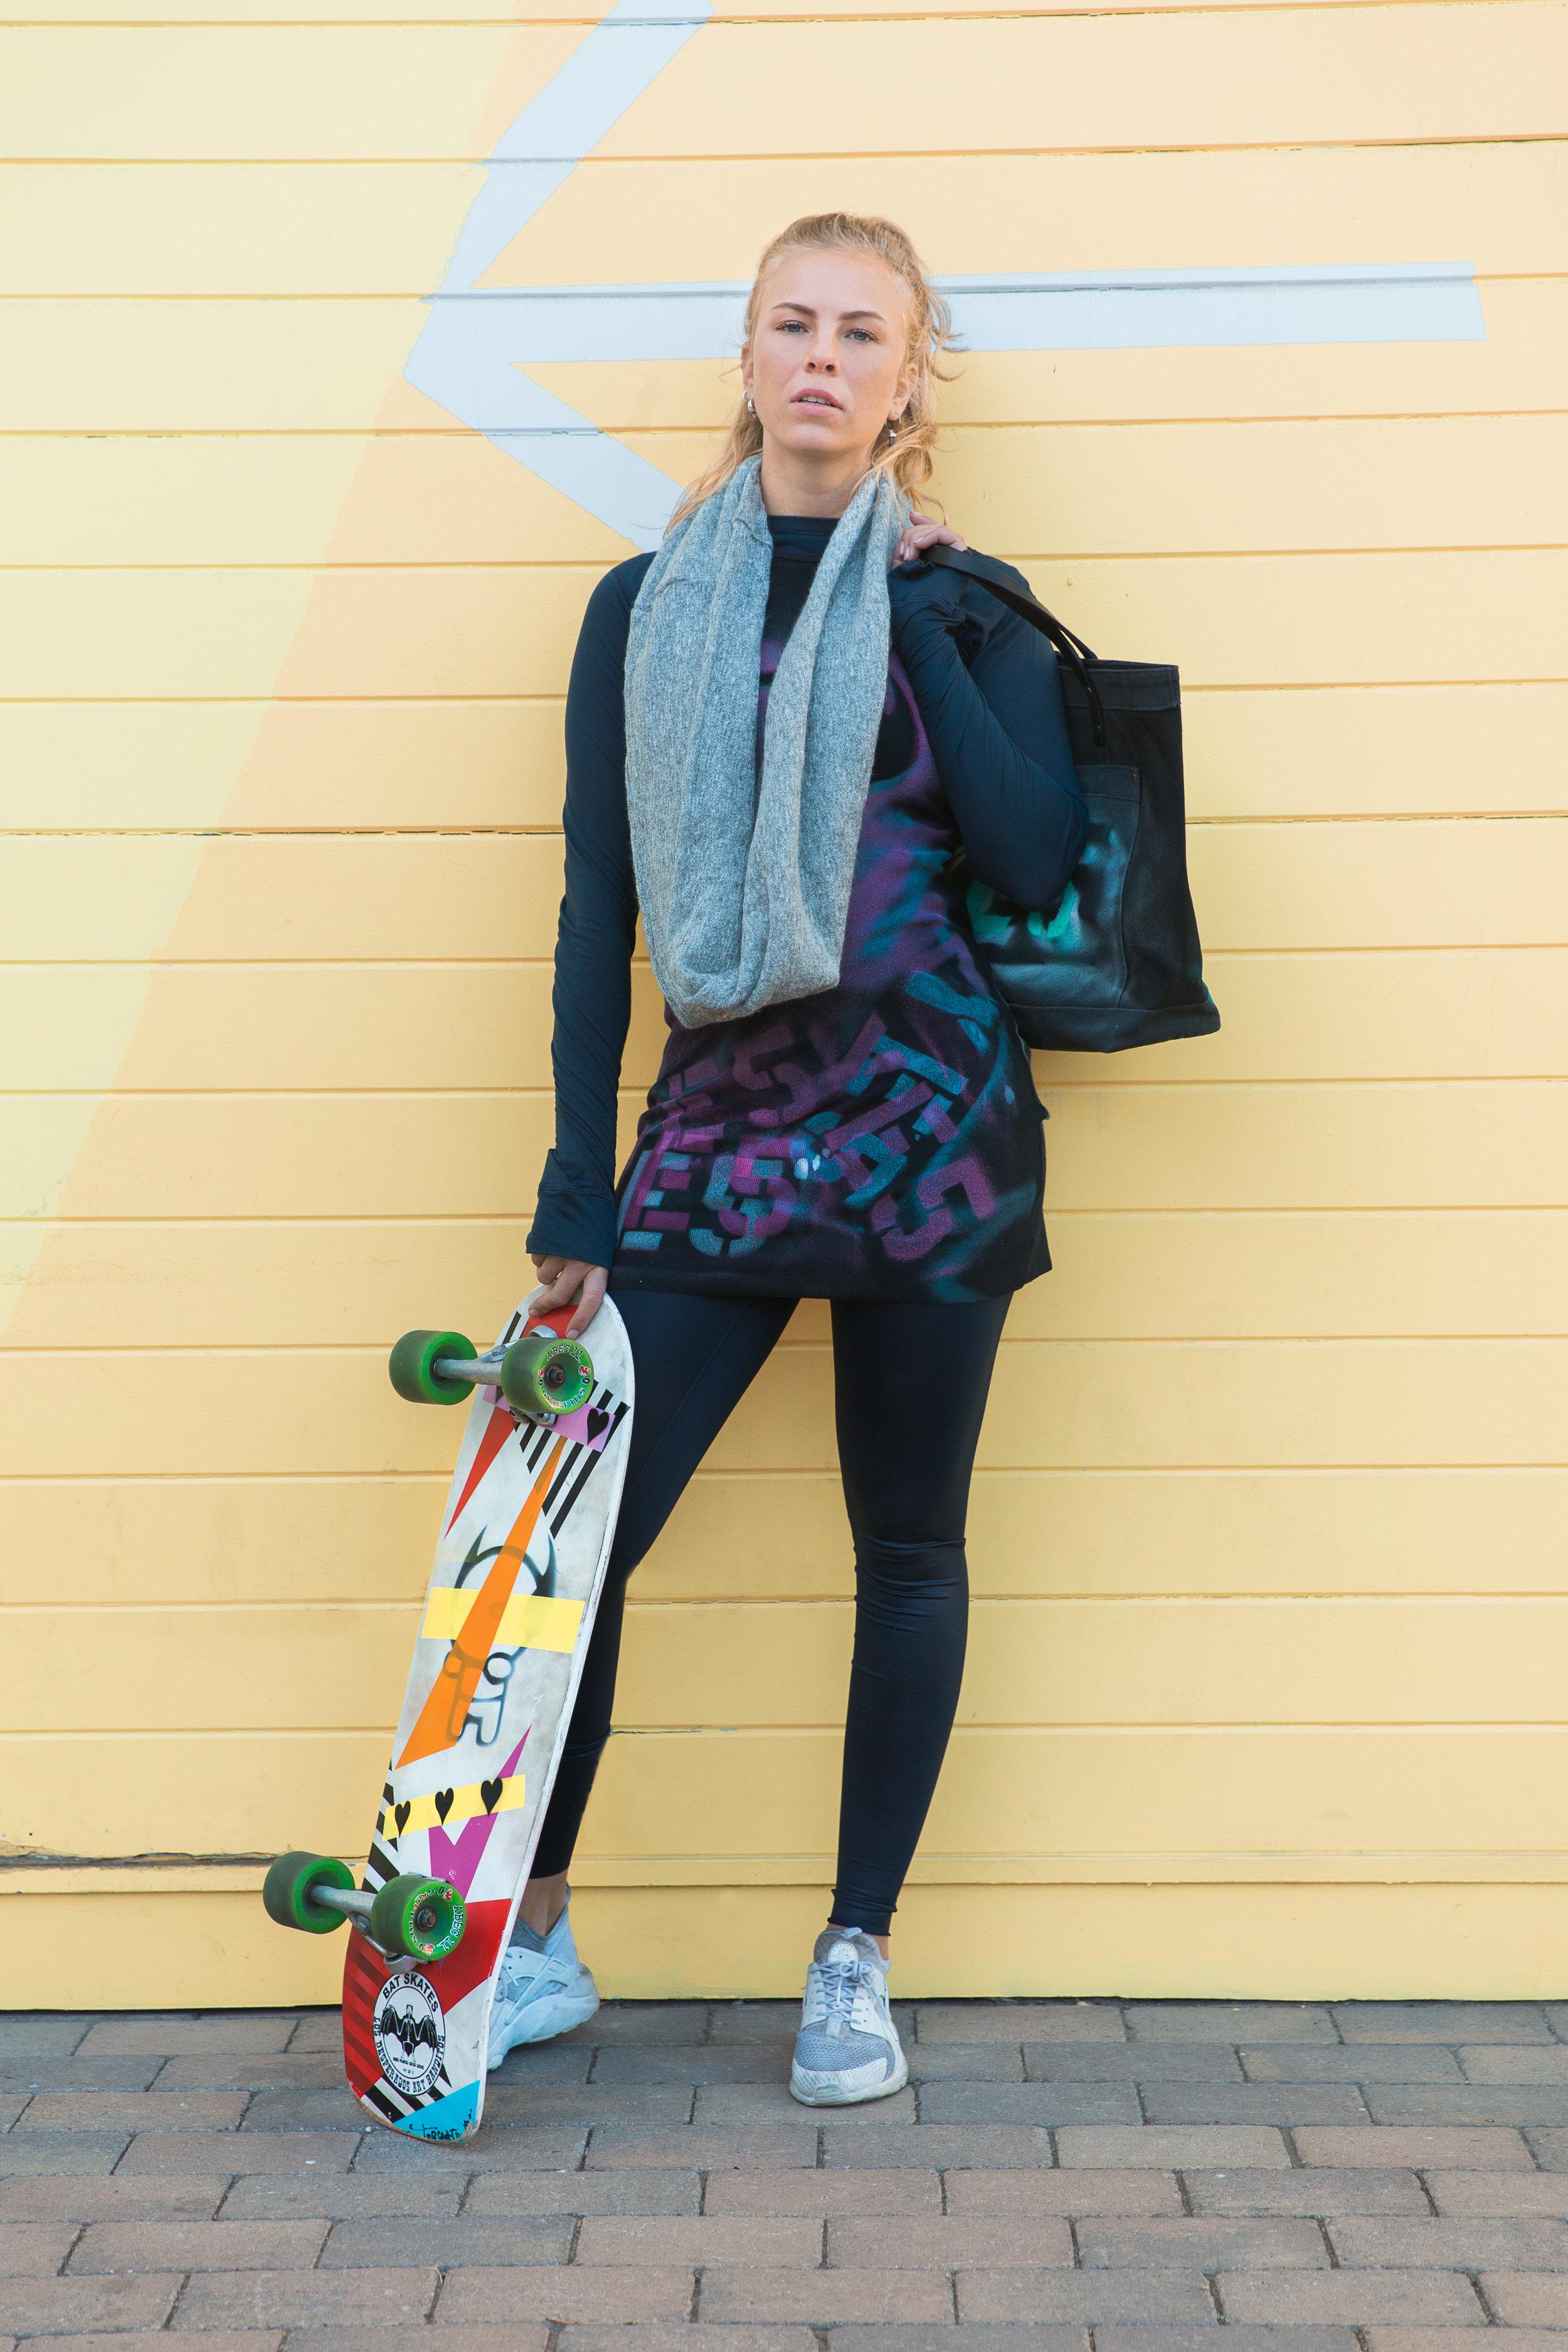 Long sleeve cashmere crewneck shirt ($130), high-rise liquid leggings in navy ($96), racerback rib dress ($268), Lux Infinity scarf ($50), Black Chester Wallace bag ($250), Torquato skateboard ($450)